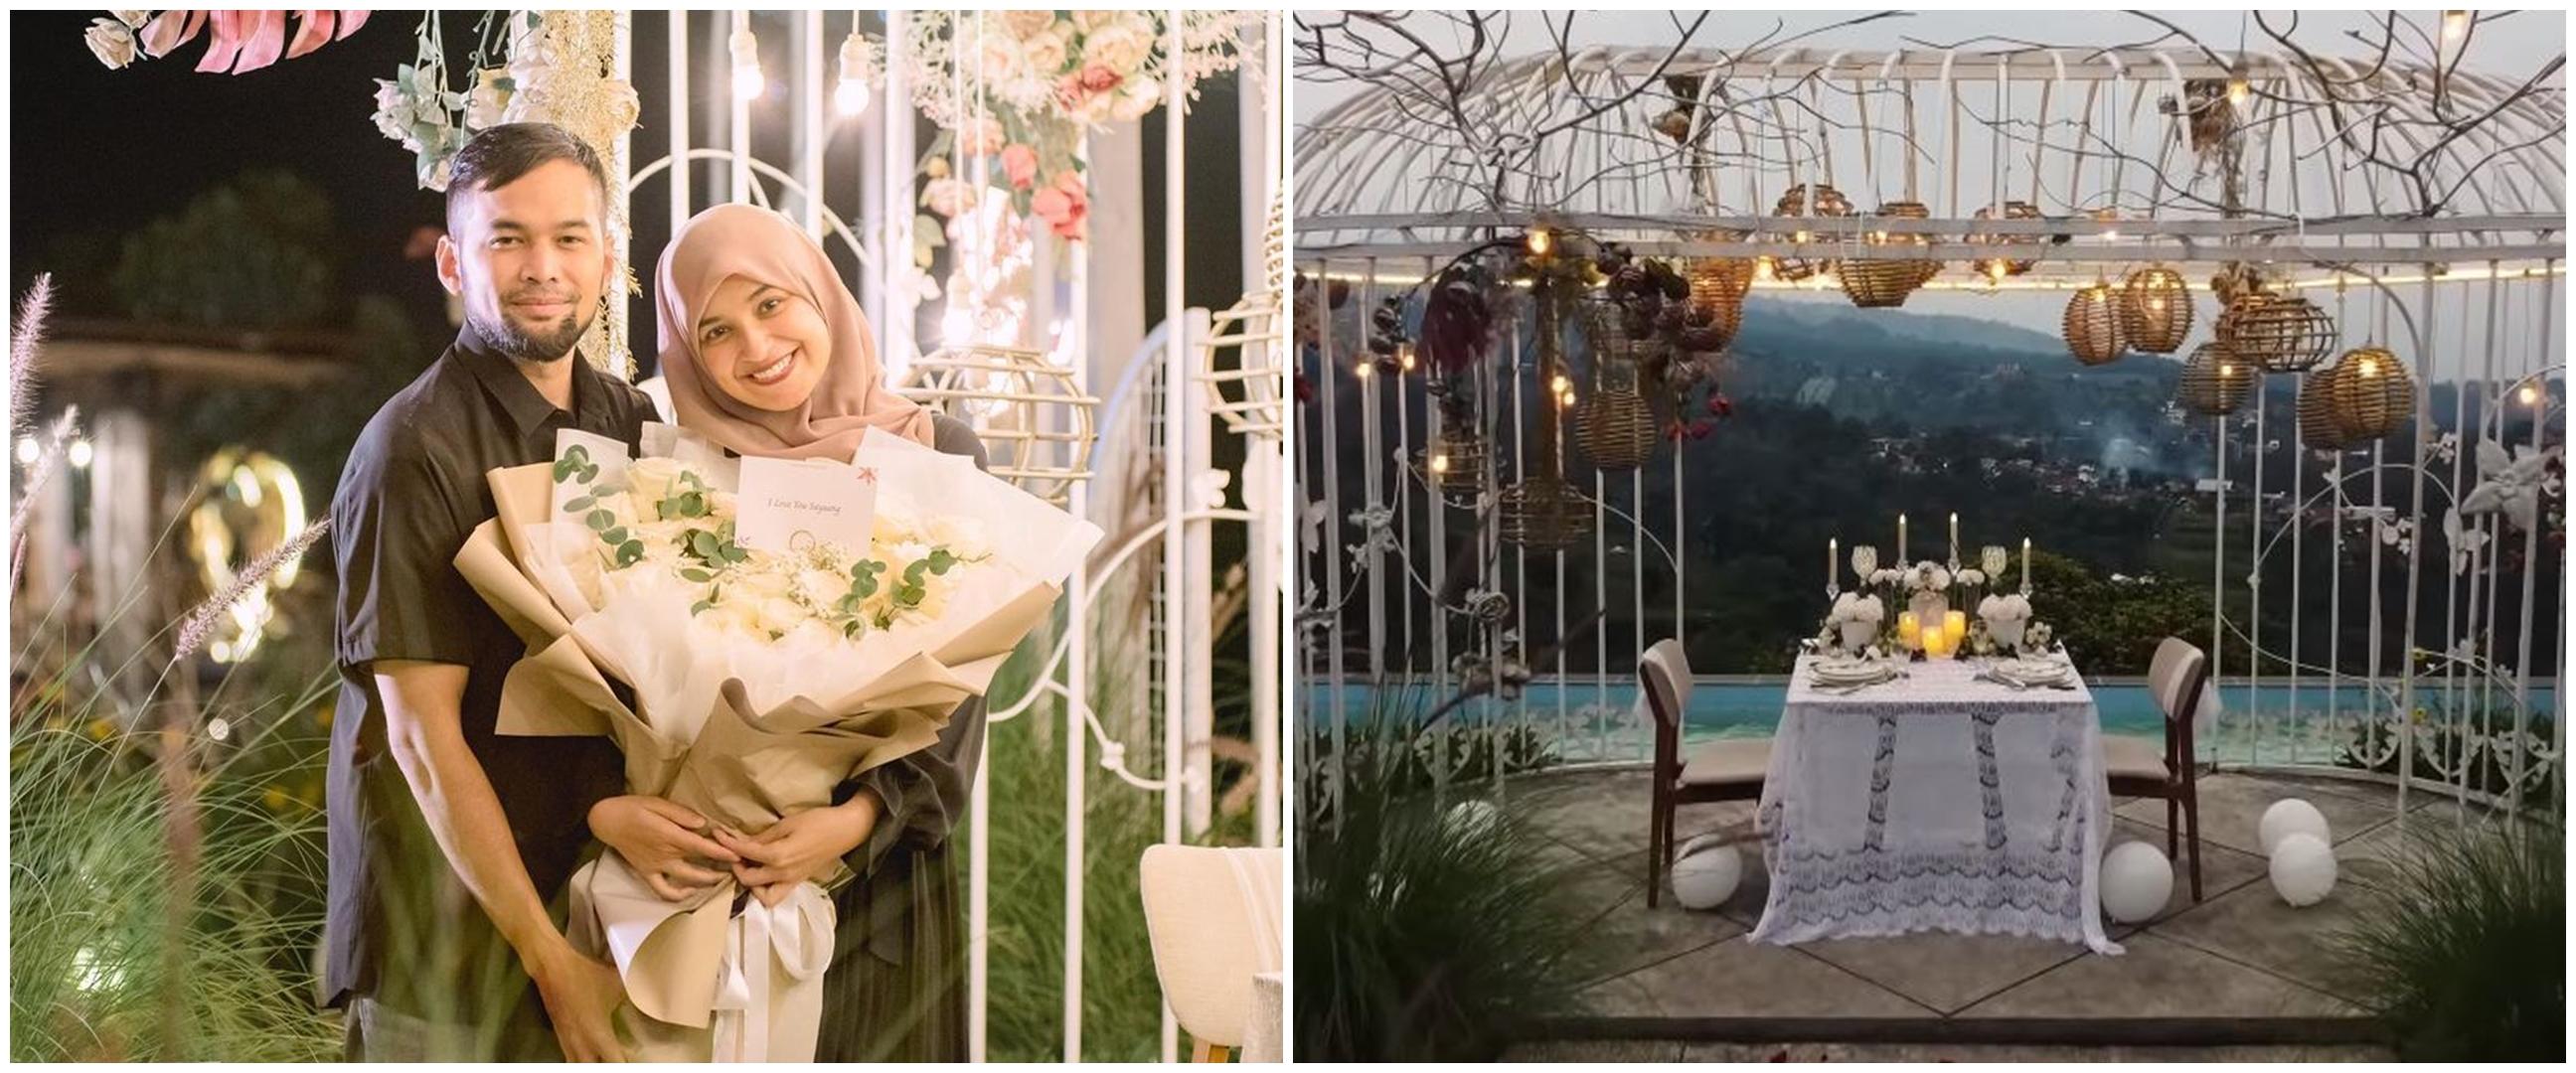 Kenang 7 tahun menikah, ini 10 momen kejutan Teuku Wisnu untuk Shireen